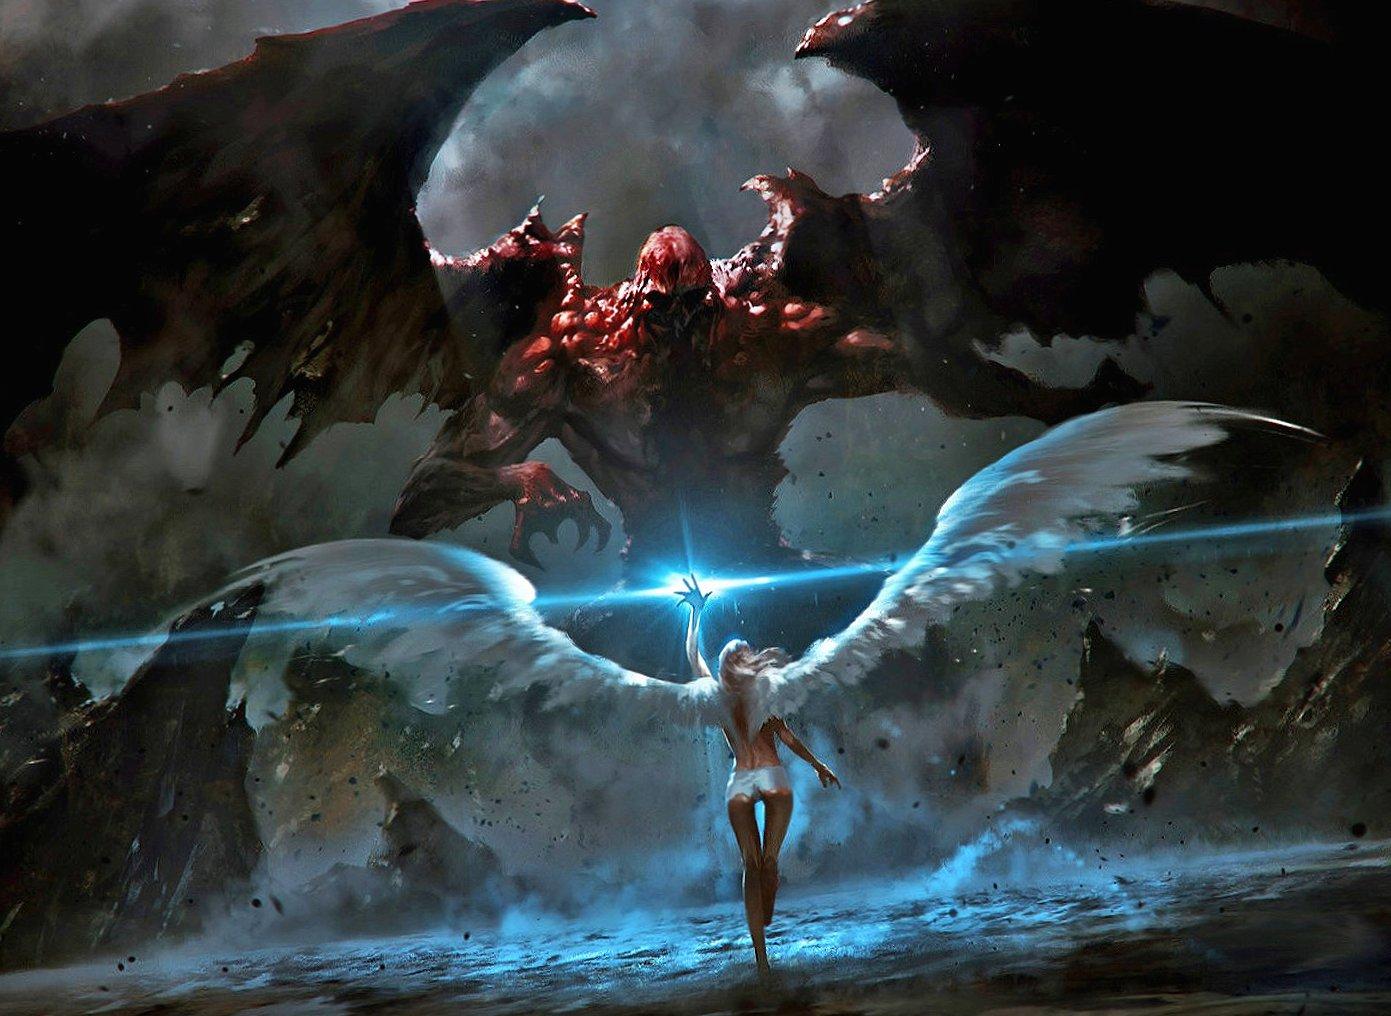 Angel vs horrible diablo wallpapers HD quality